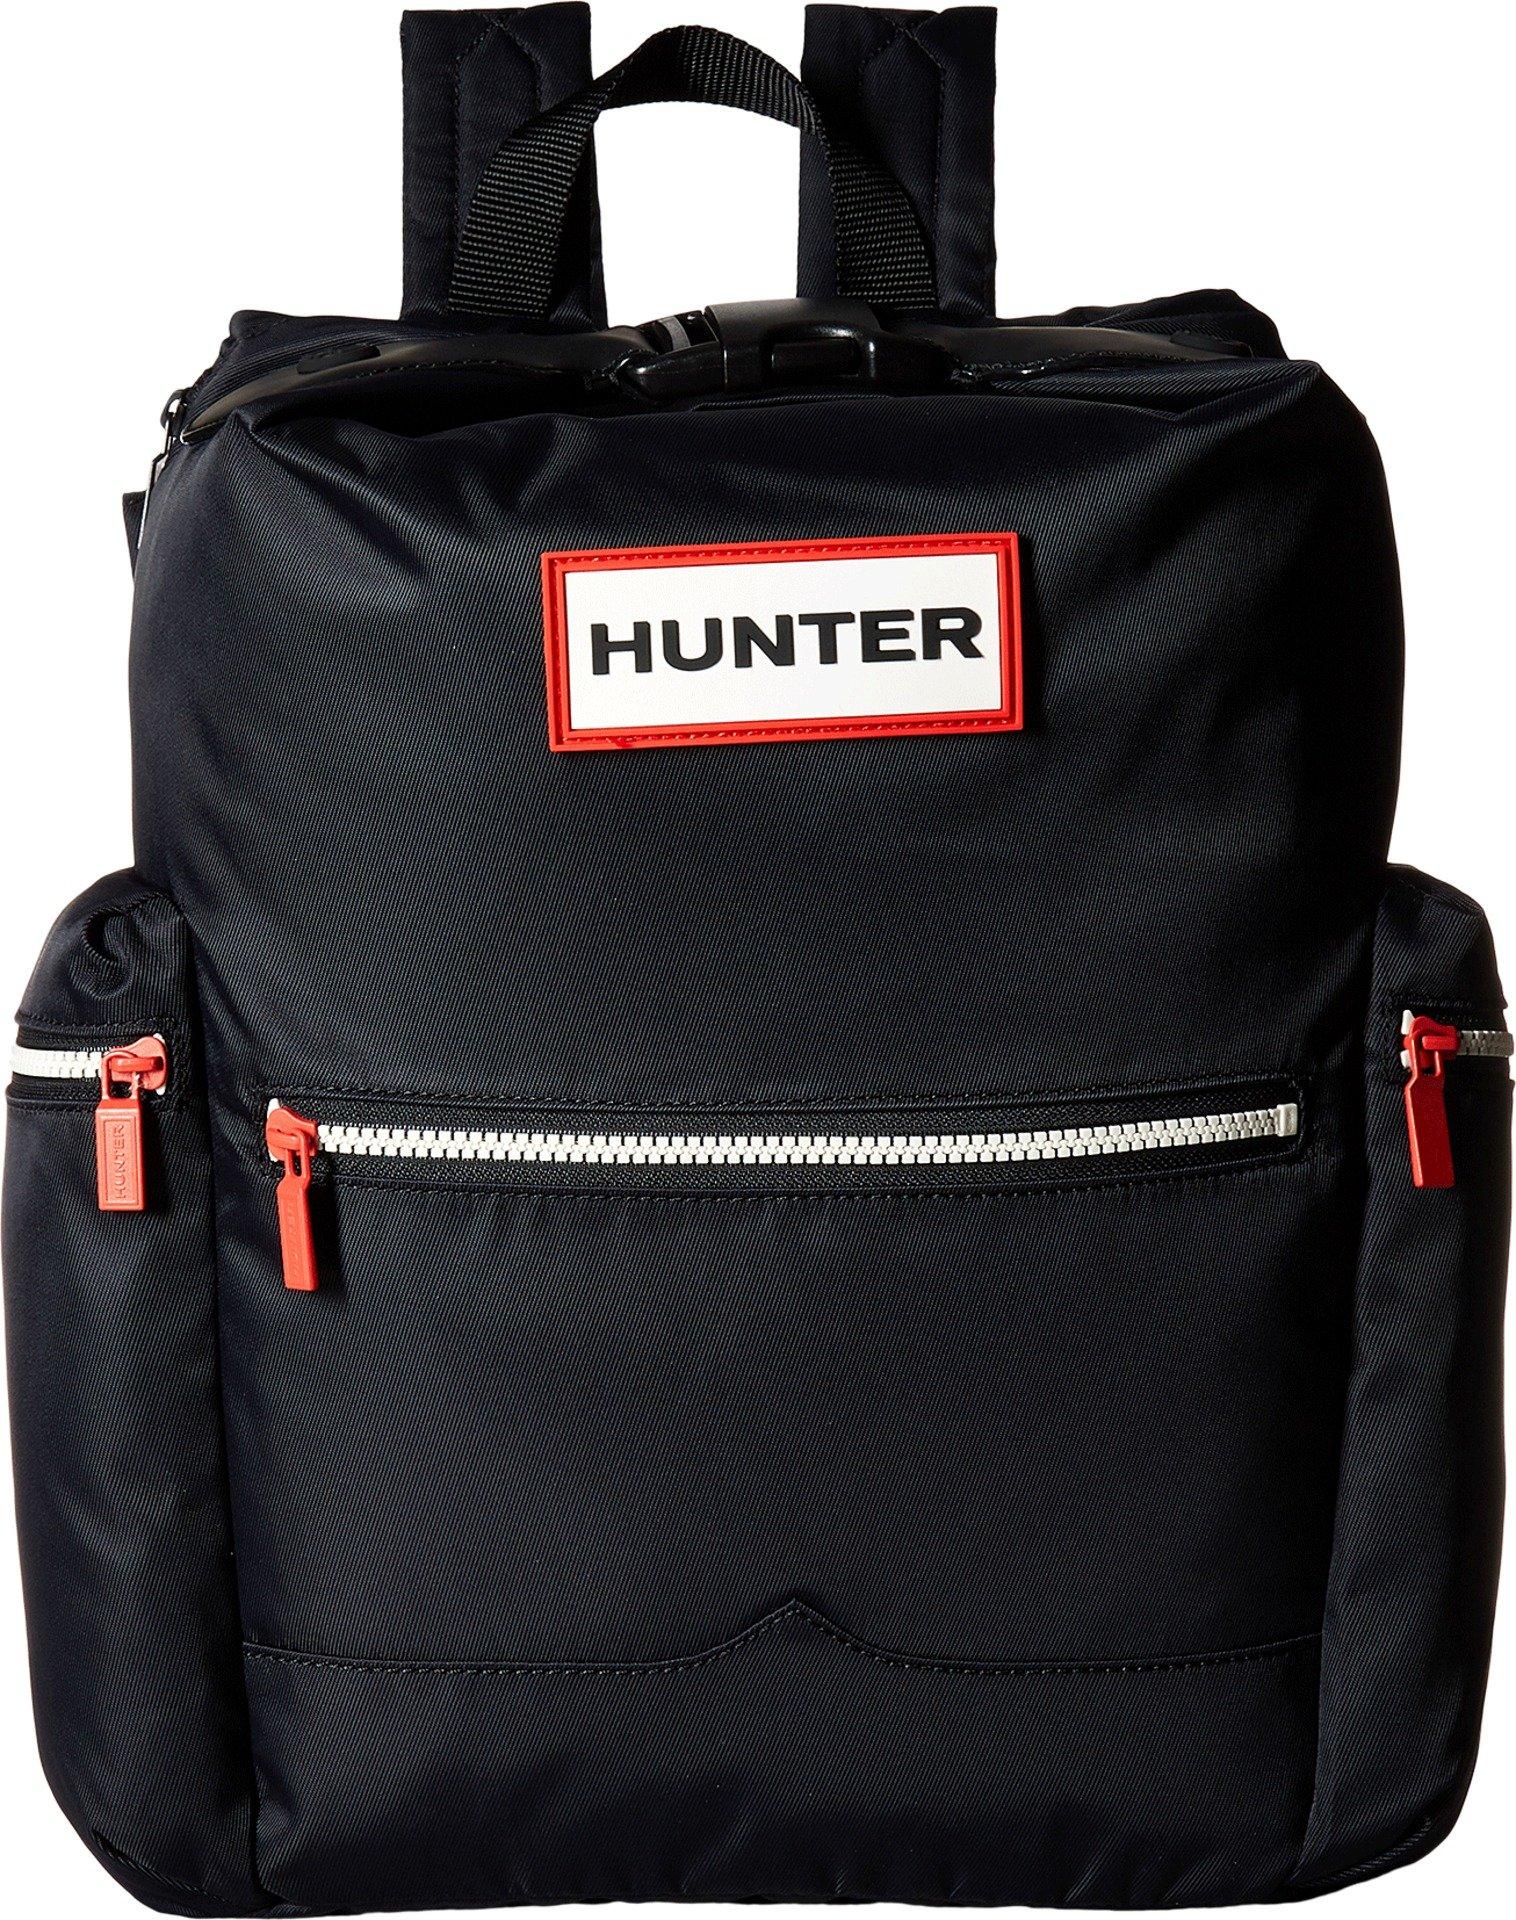 Hunter Boots Men's Original Nylon Backpack, Black, One Size